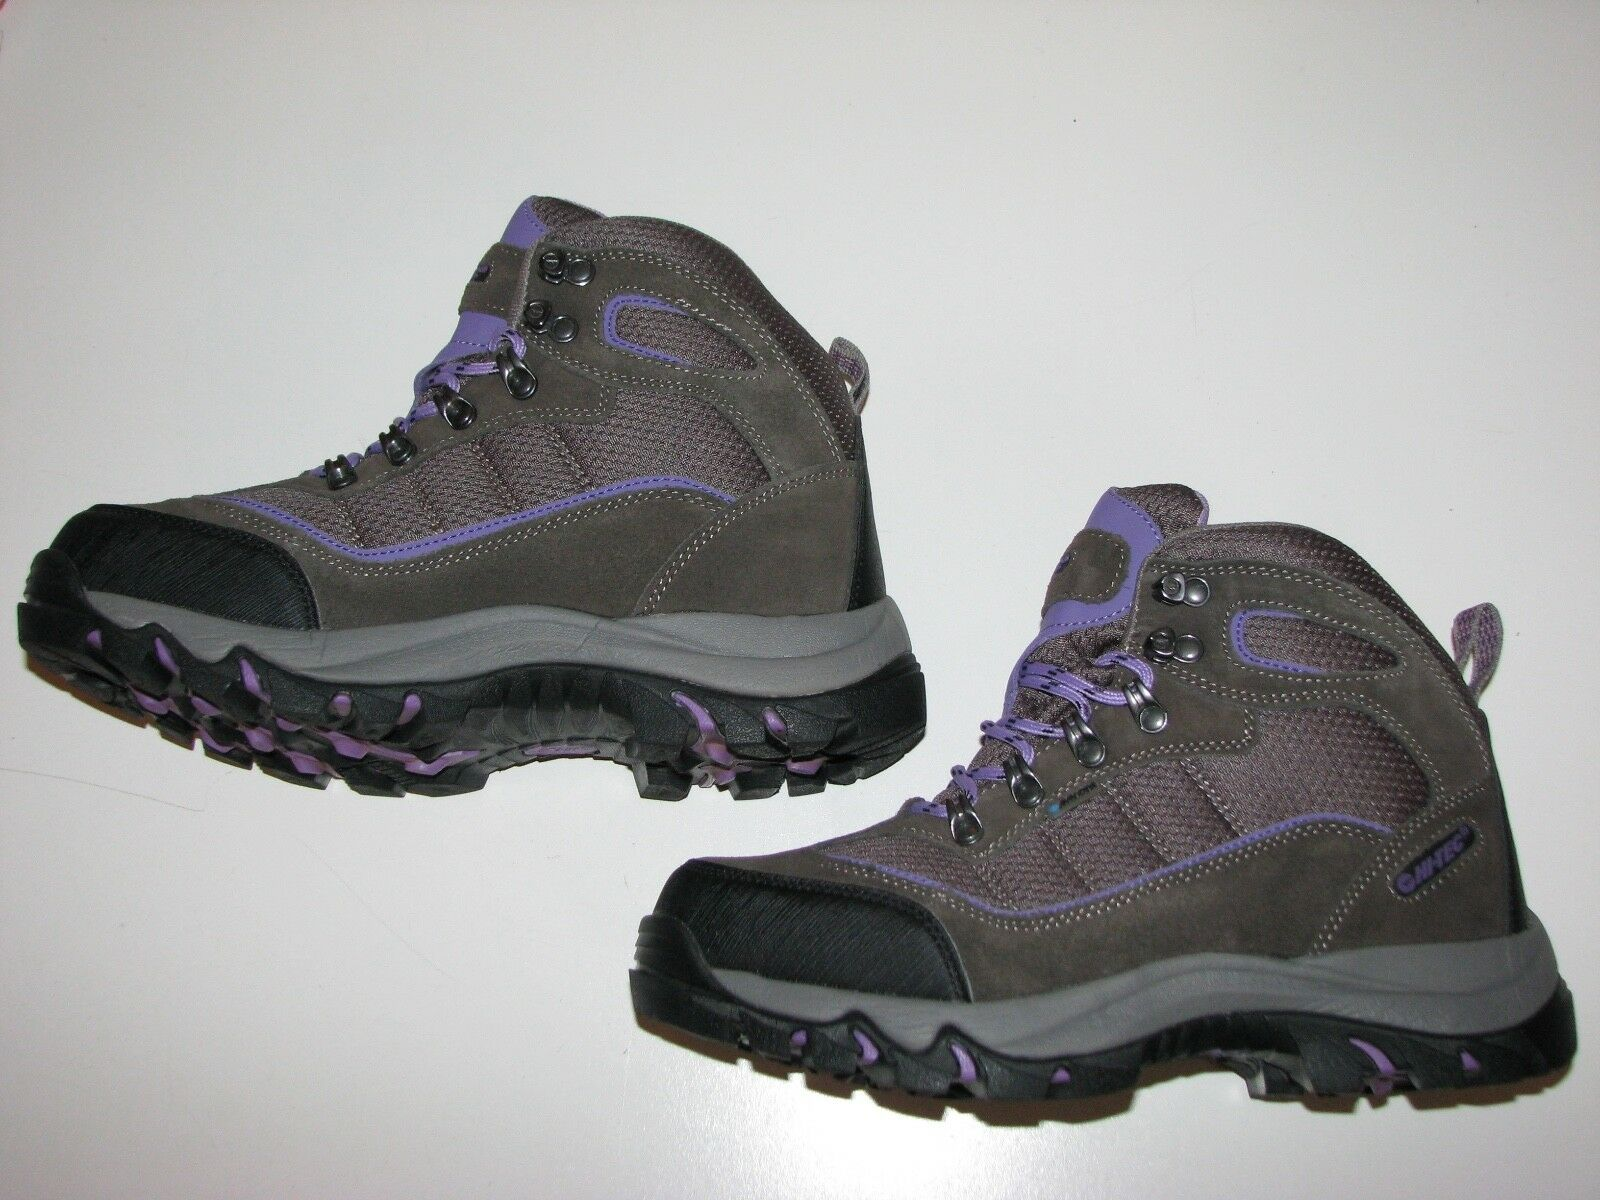 Hi-Tec Scamania Waterproof Hiking Boots, shoes sz 8.5M